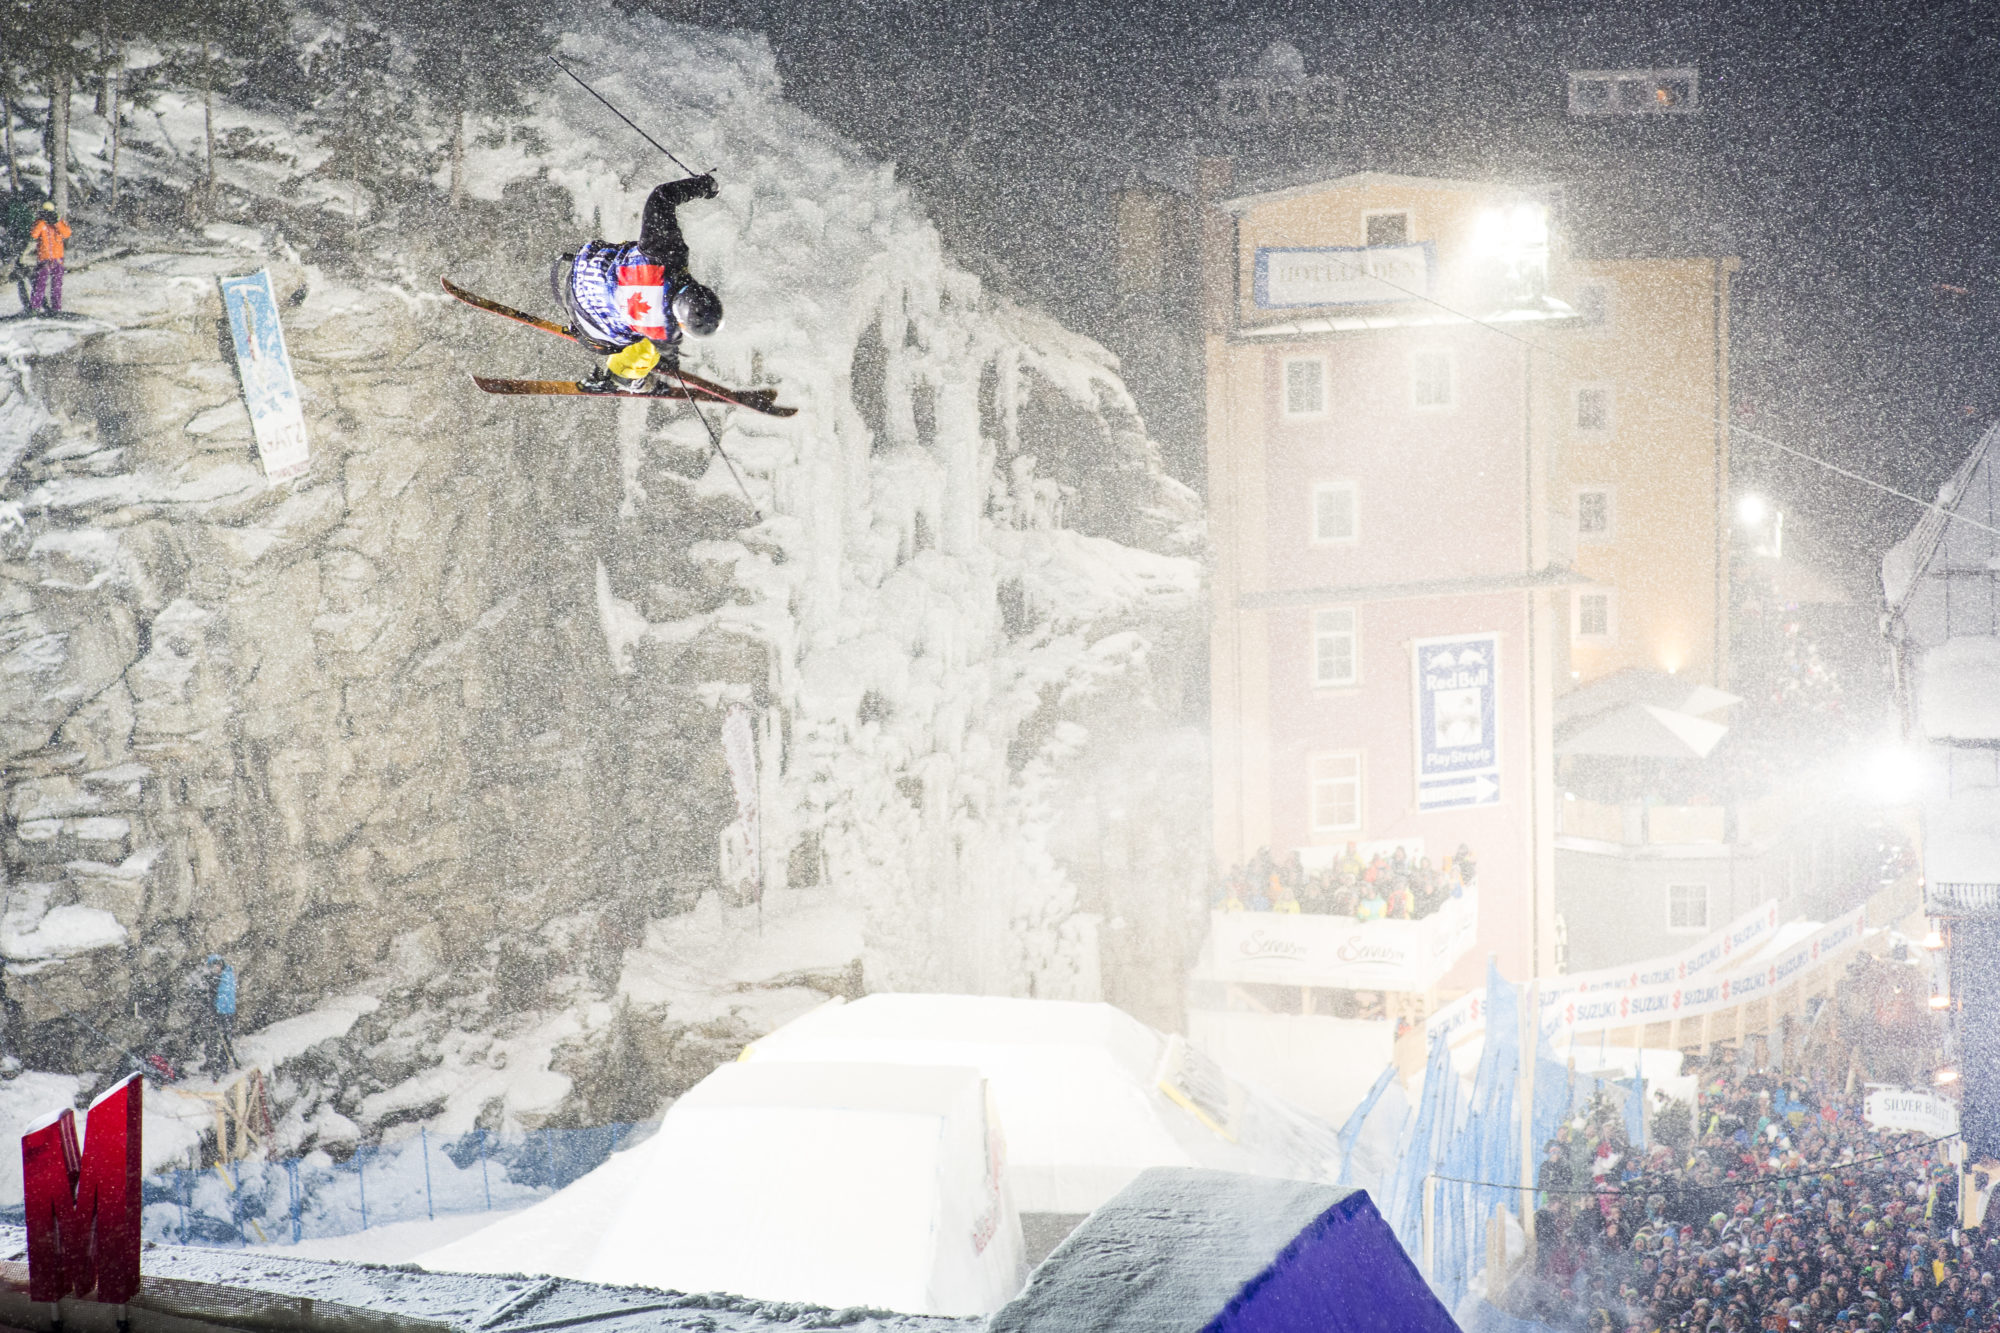 Erwin Polanc/Red Bull